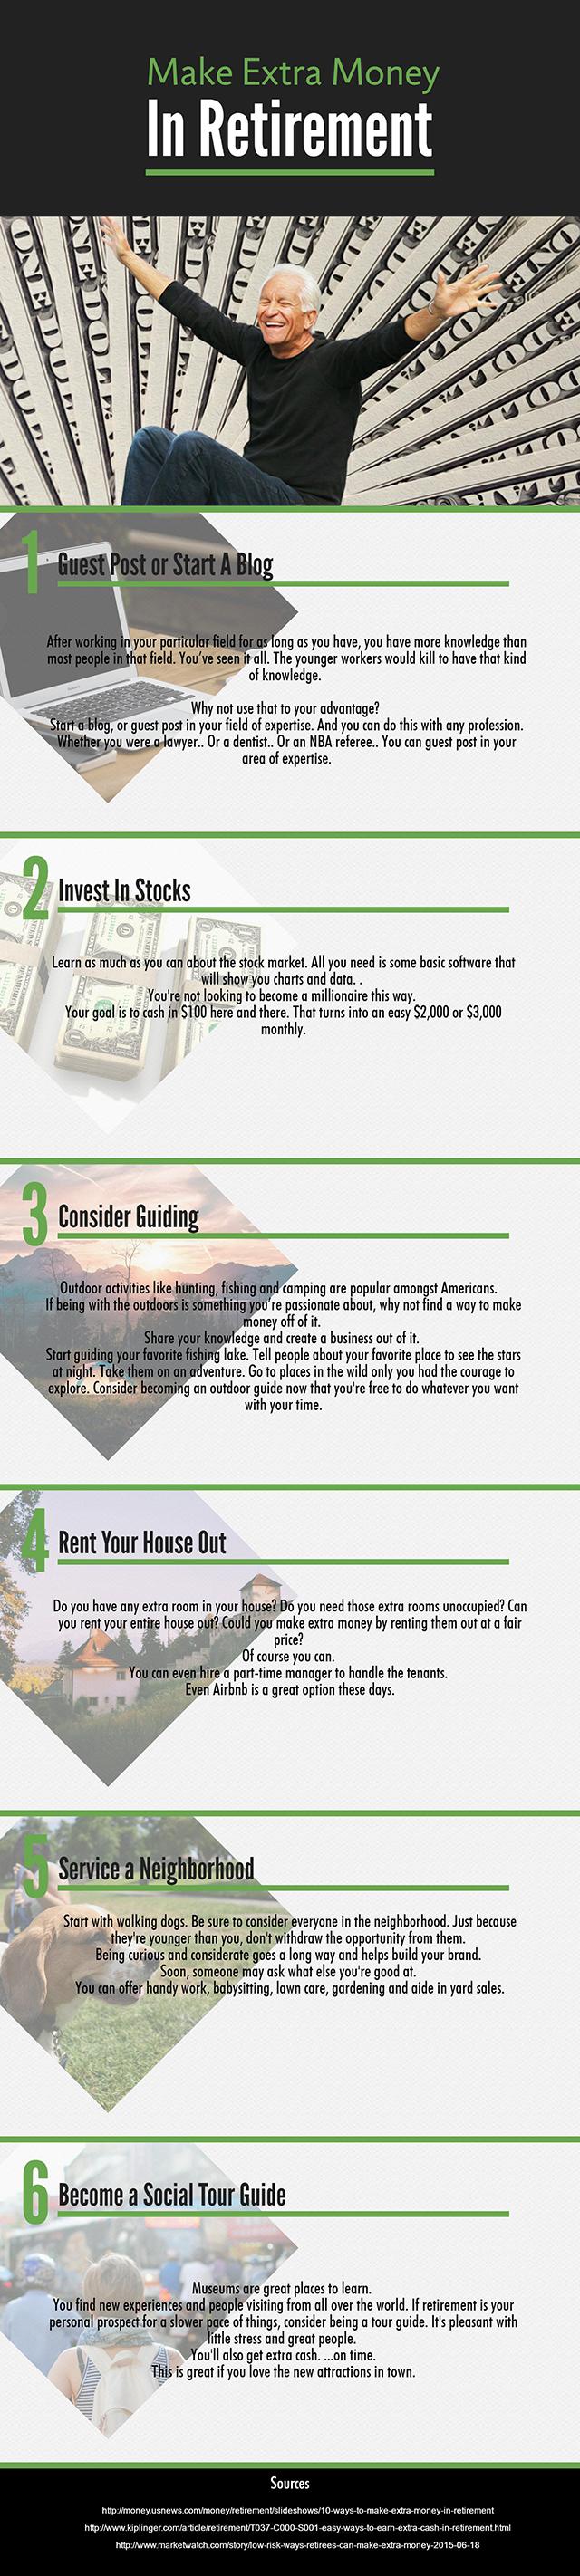 Mak Extra Money In Retirement - Infographic